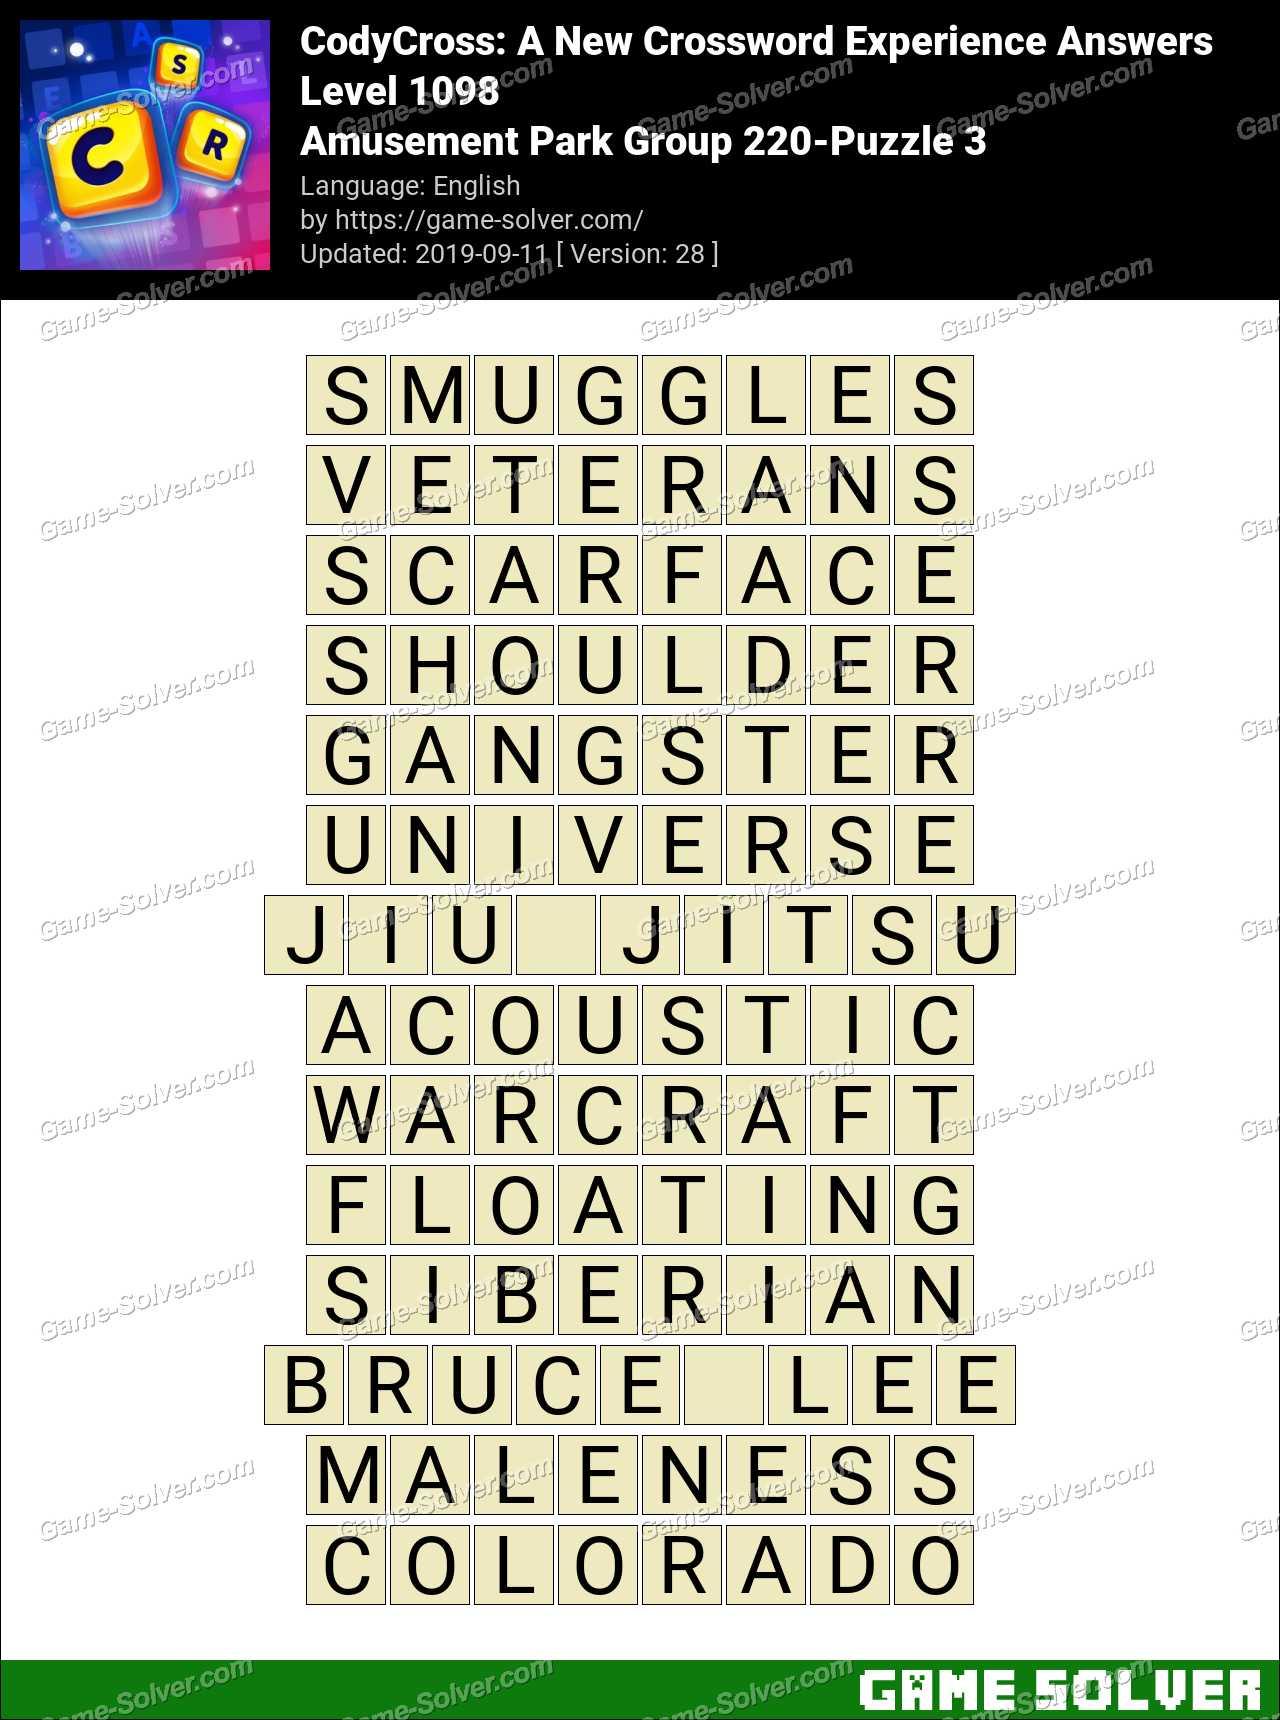 CodyCross Amusement Park Group 220-Puzzle 3 Answers